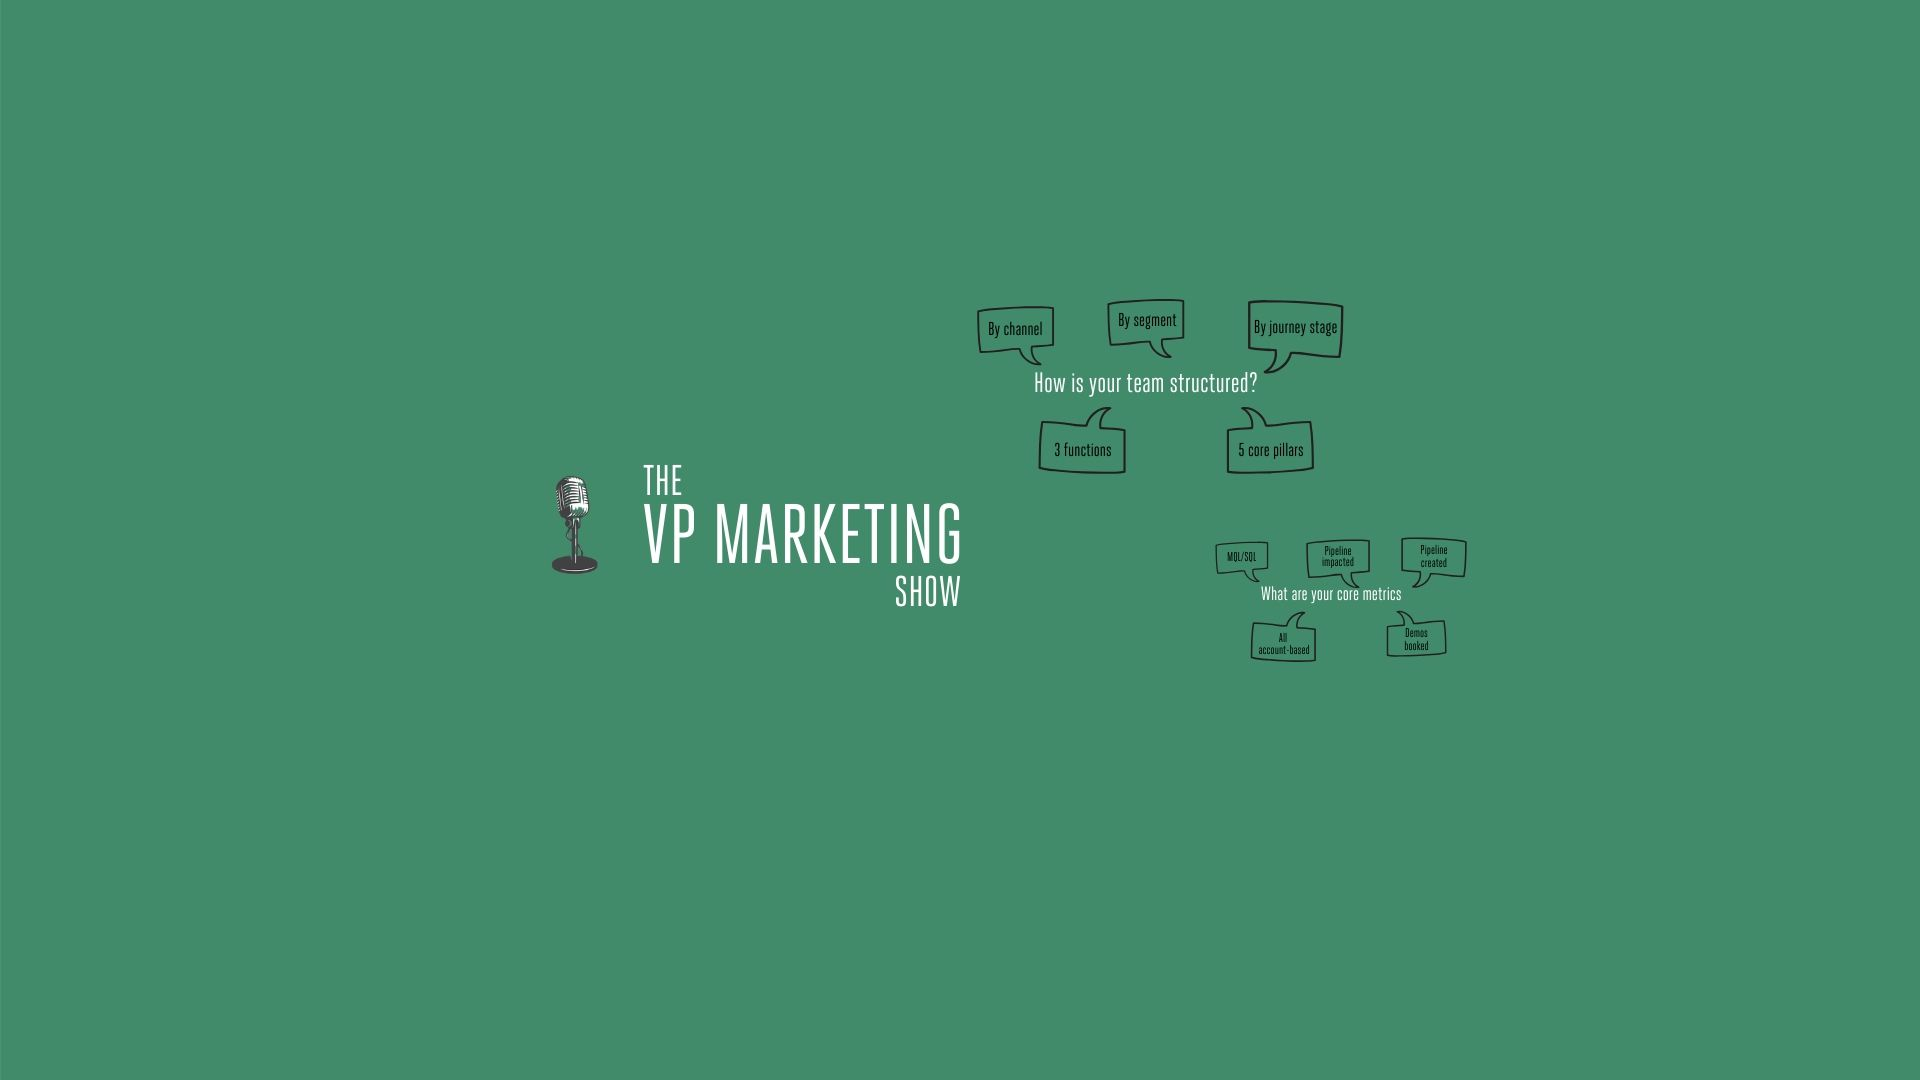 The VP Marketing Show